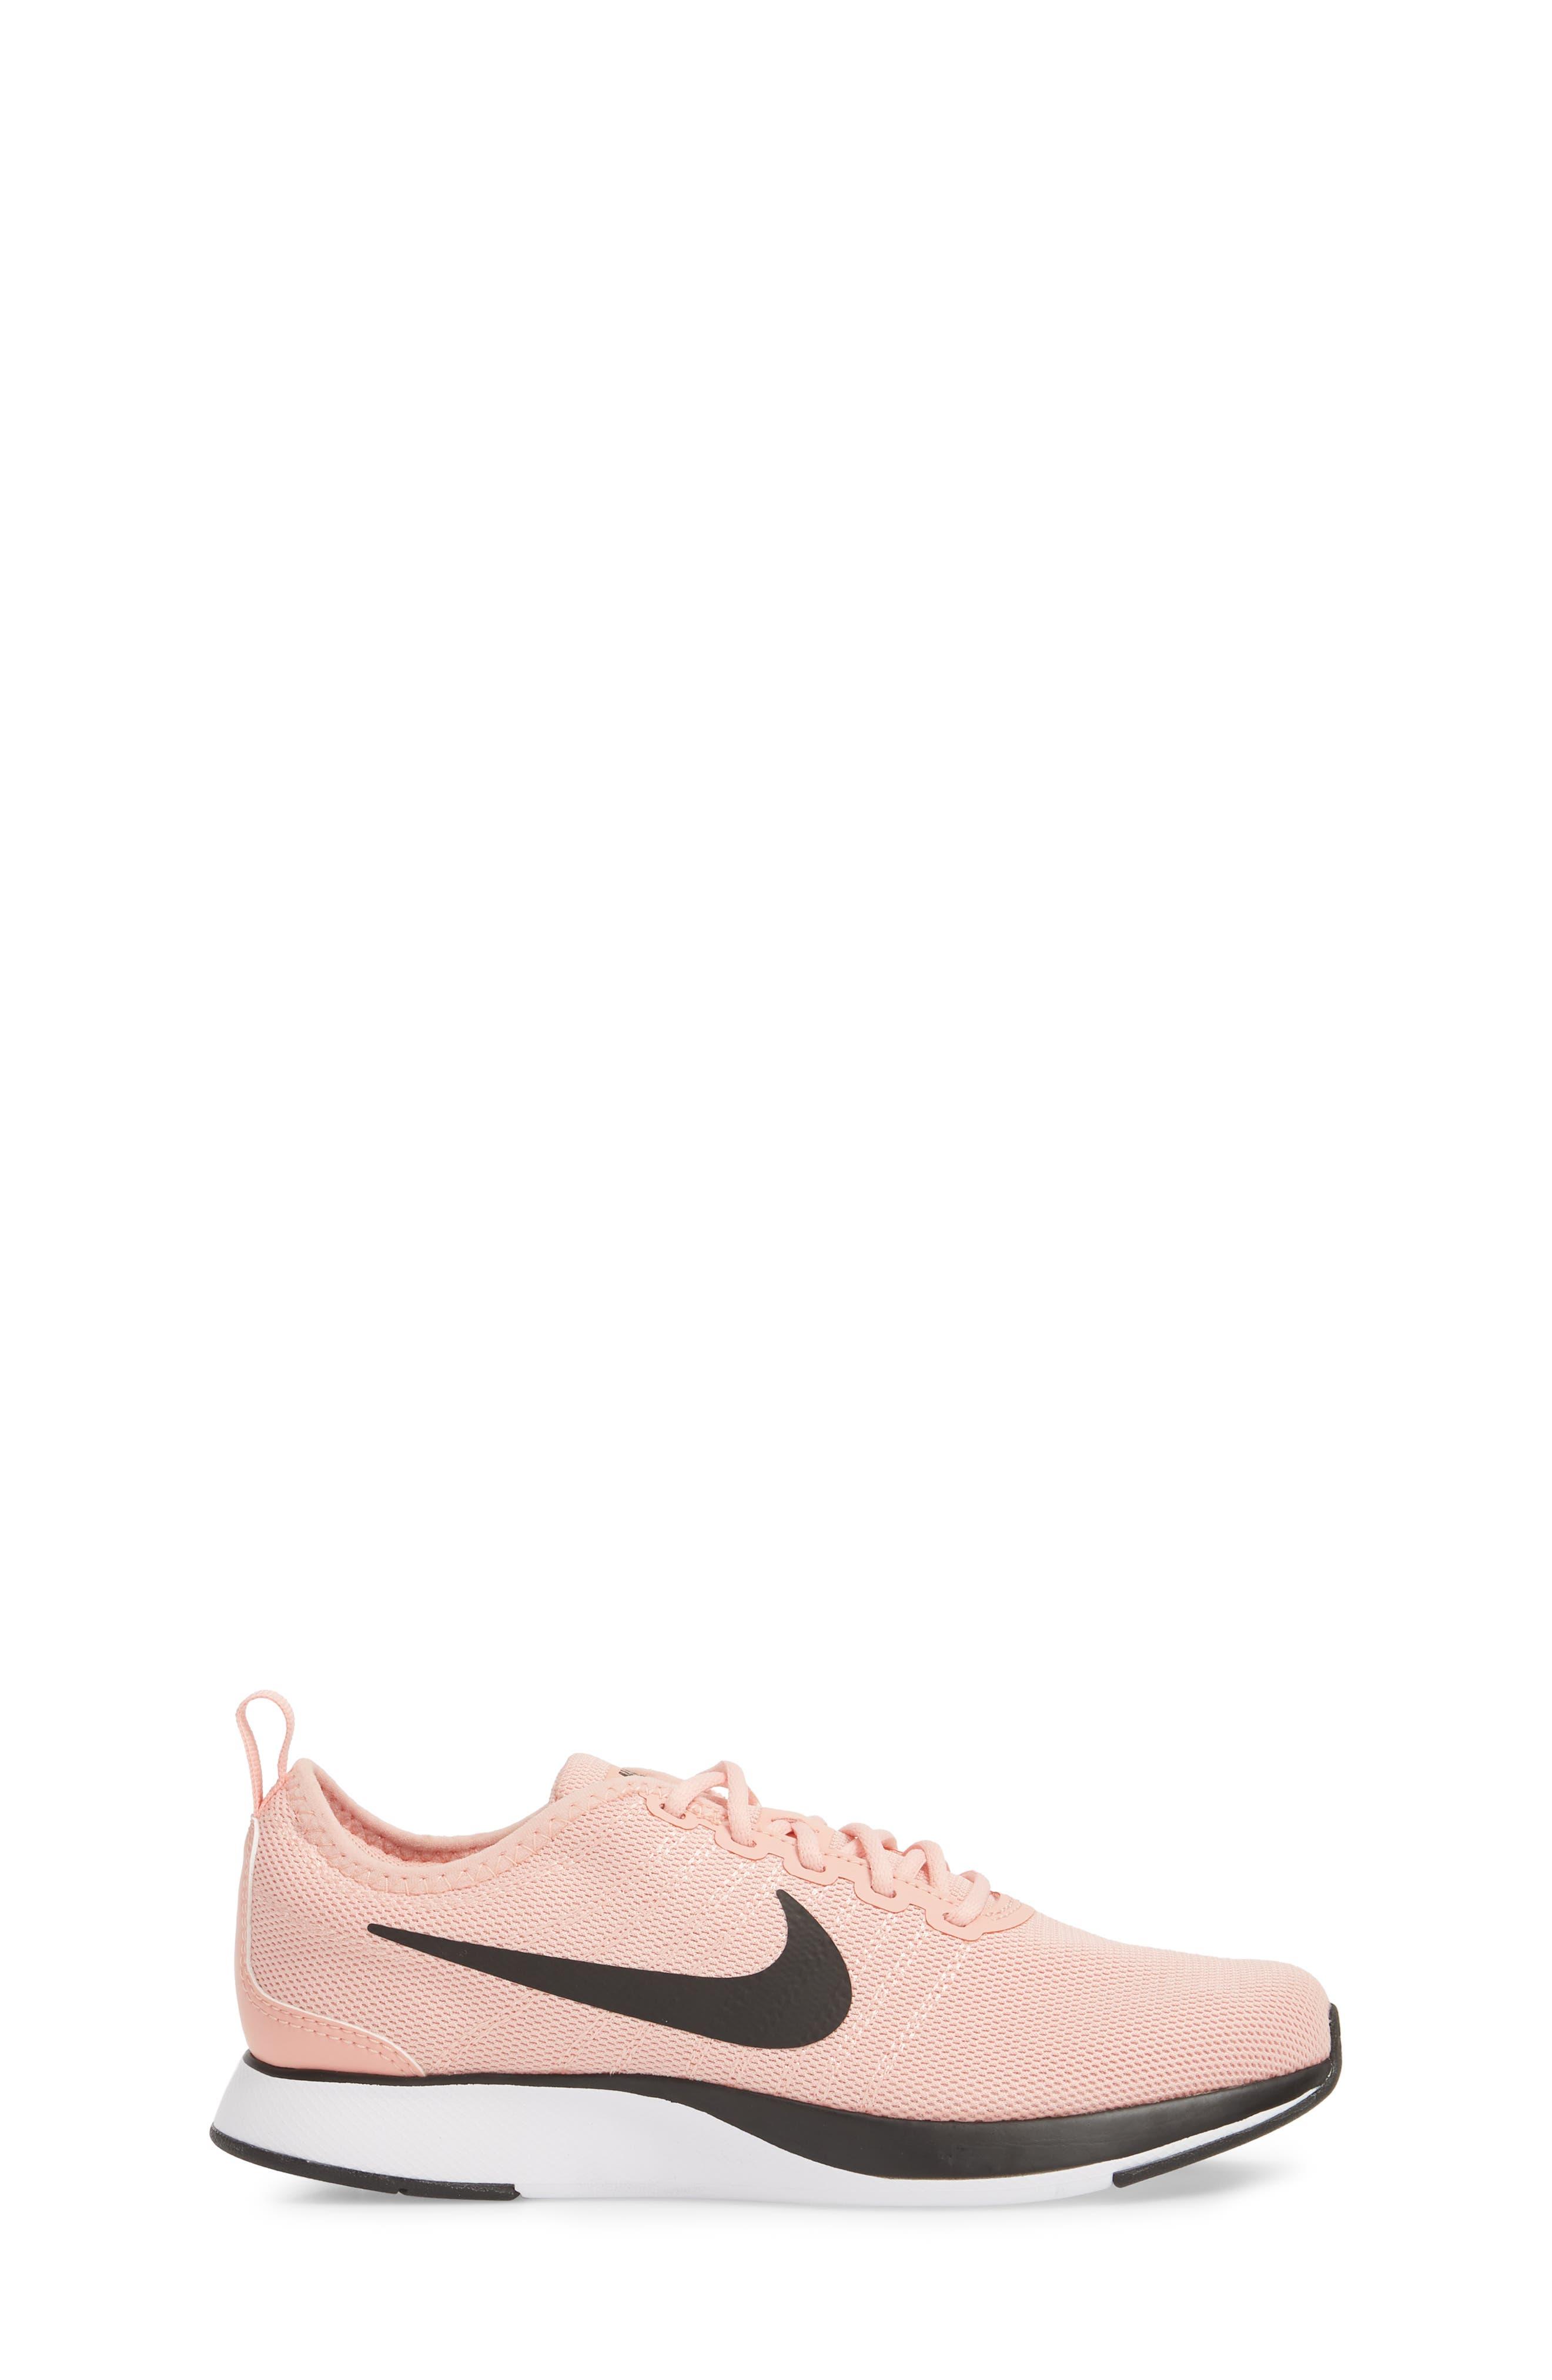 Dualtone Racer GS Sneaker,                             Alternate thumbnail 9, color,